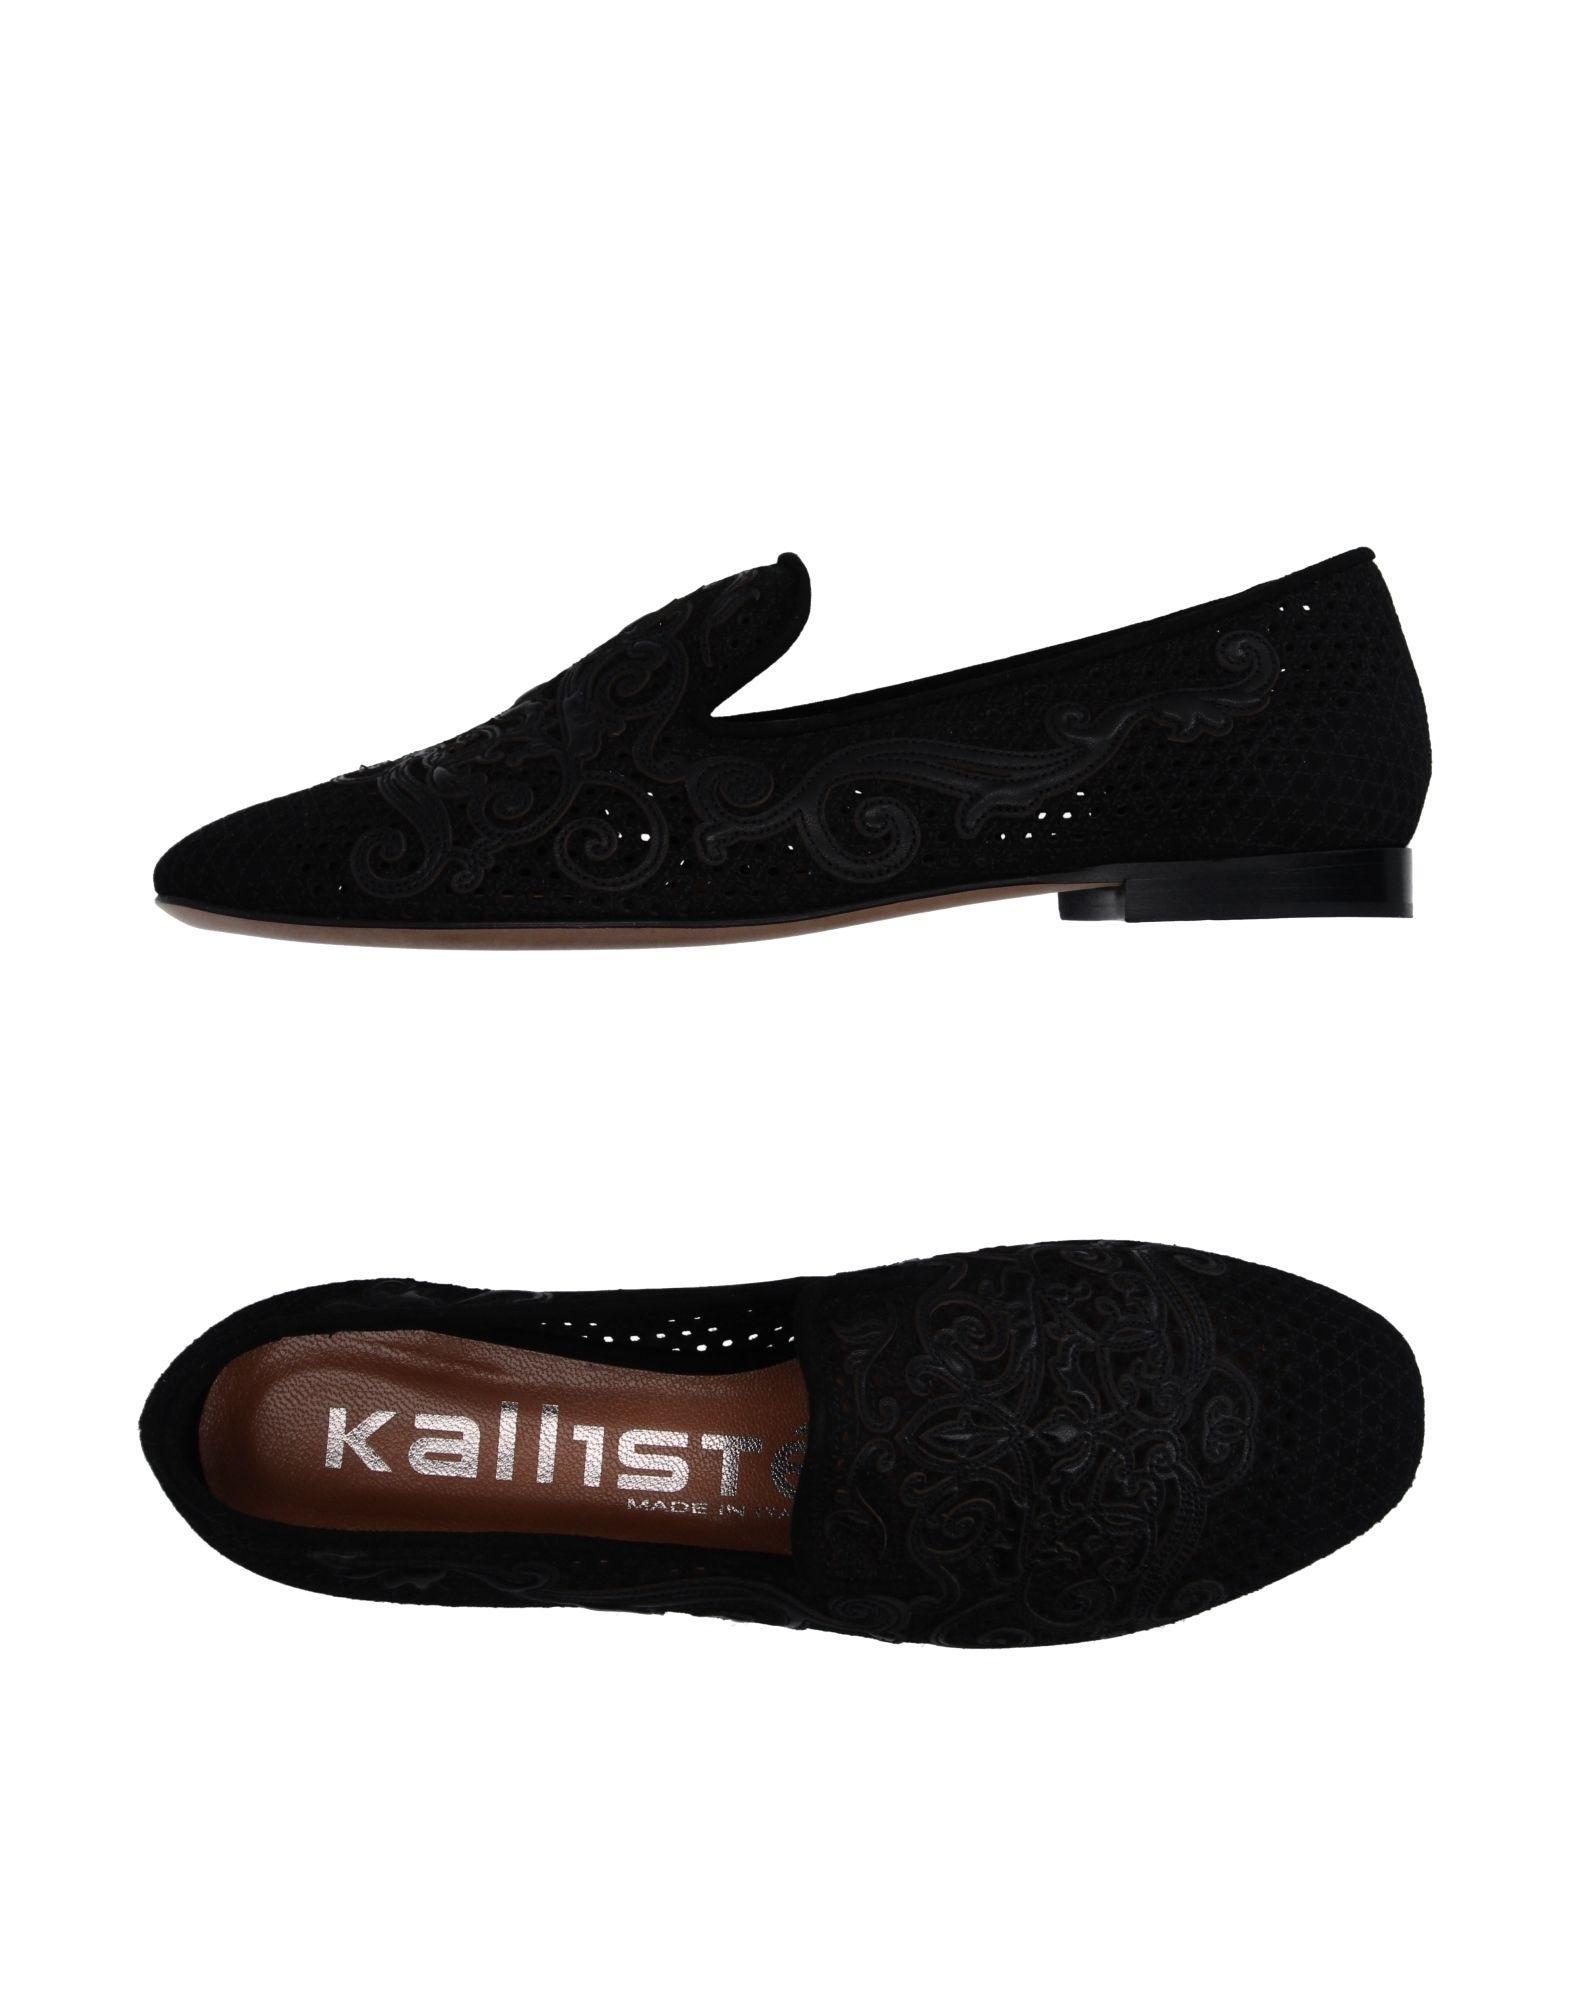 Kalliste Womens Shoes